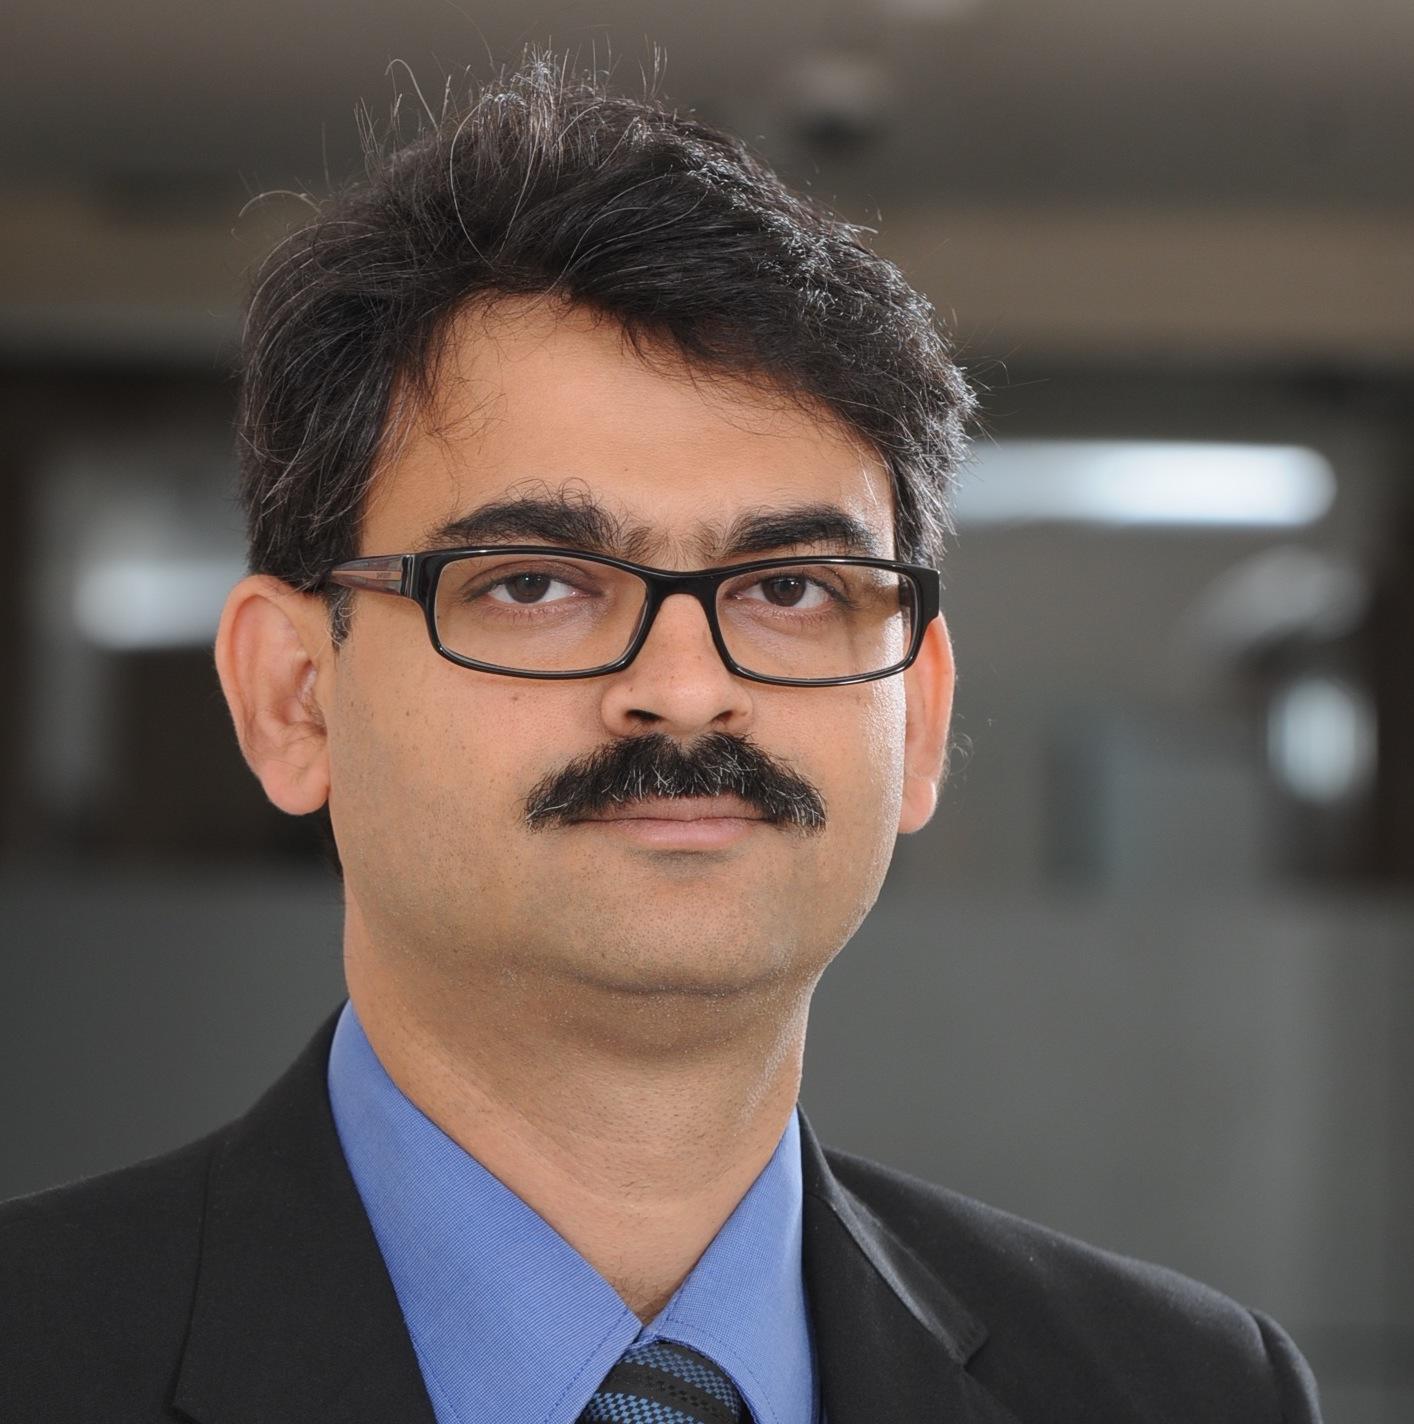 Dr Bhabatosh Mishra